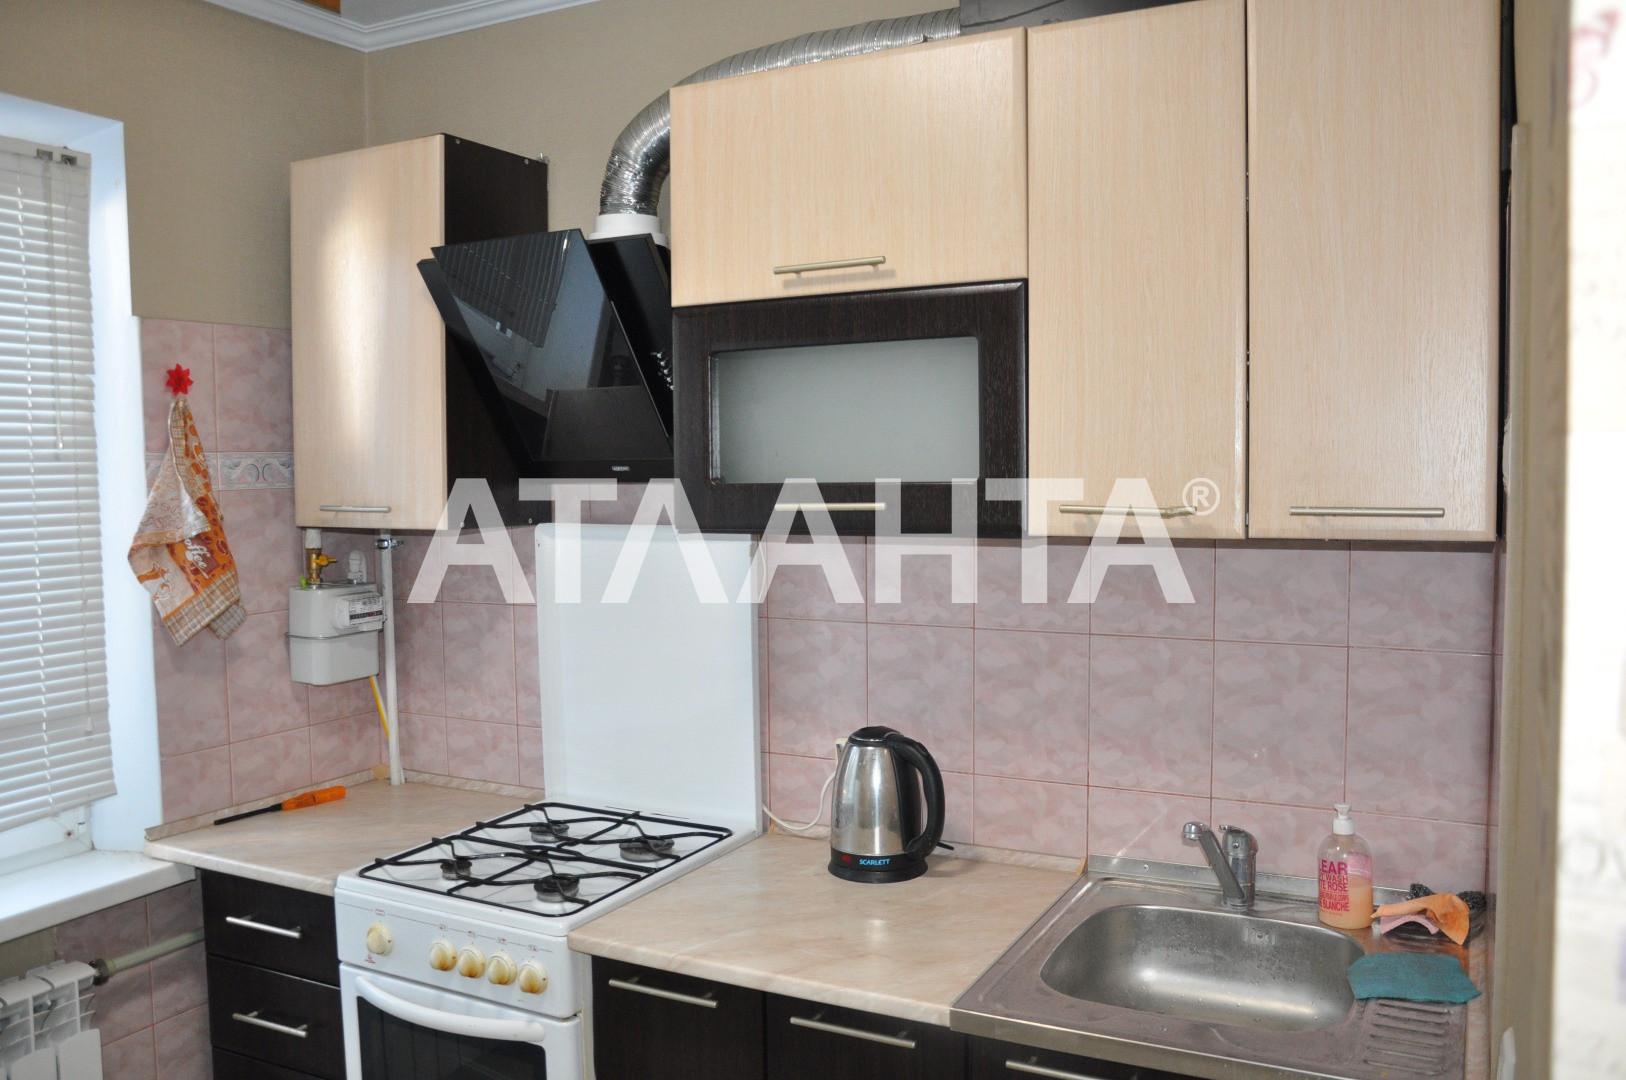 Продается 2-комнатная Квартира на ул. Ивана И Юрия Липы (Гайдара) — 38 000 у.е.